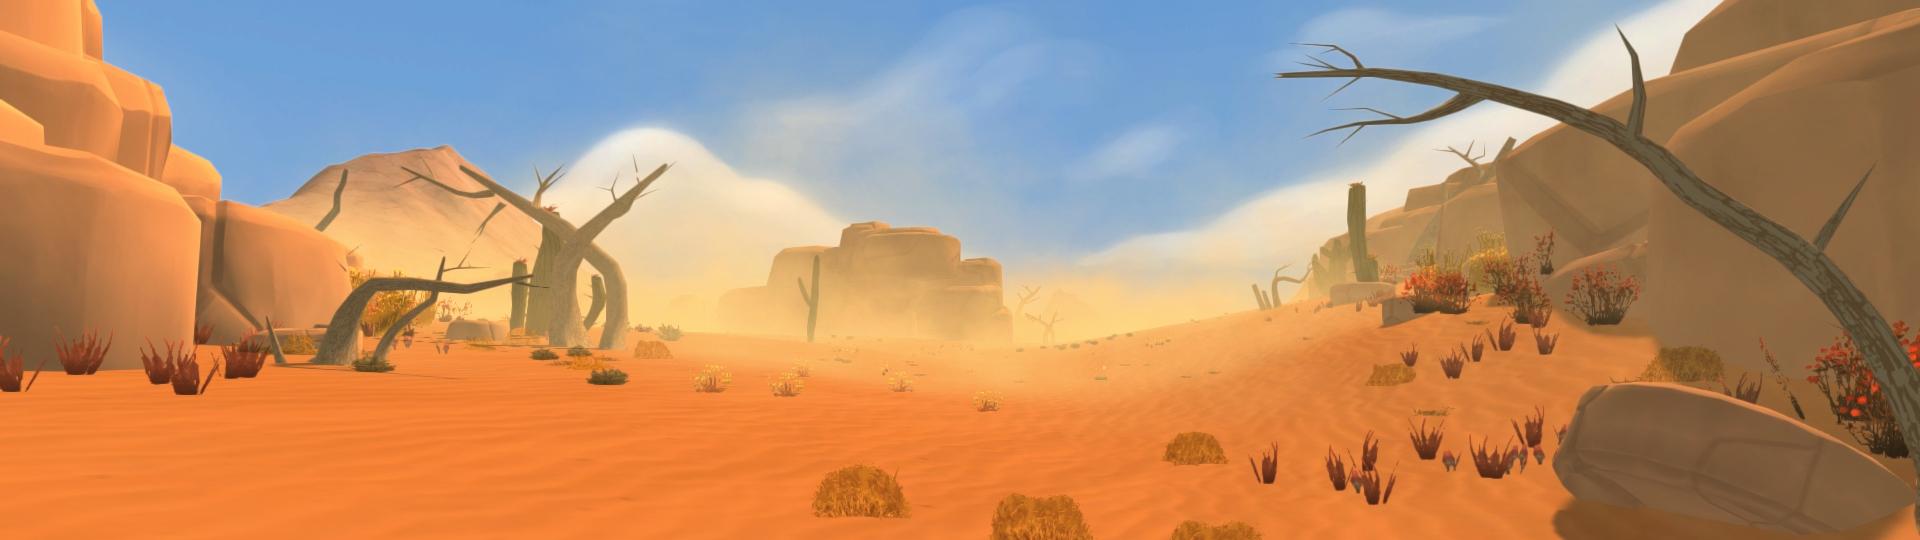 wide desert 01